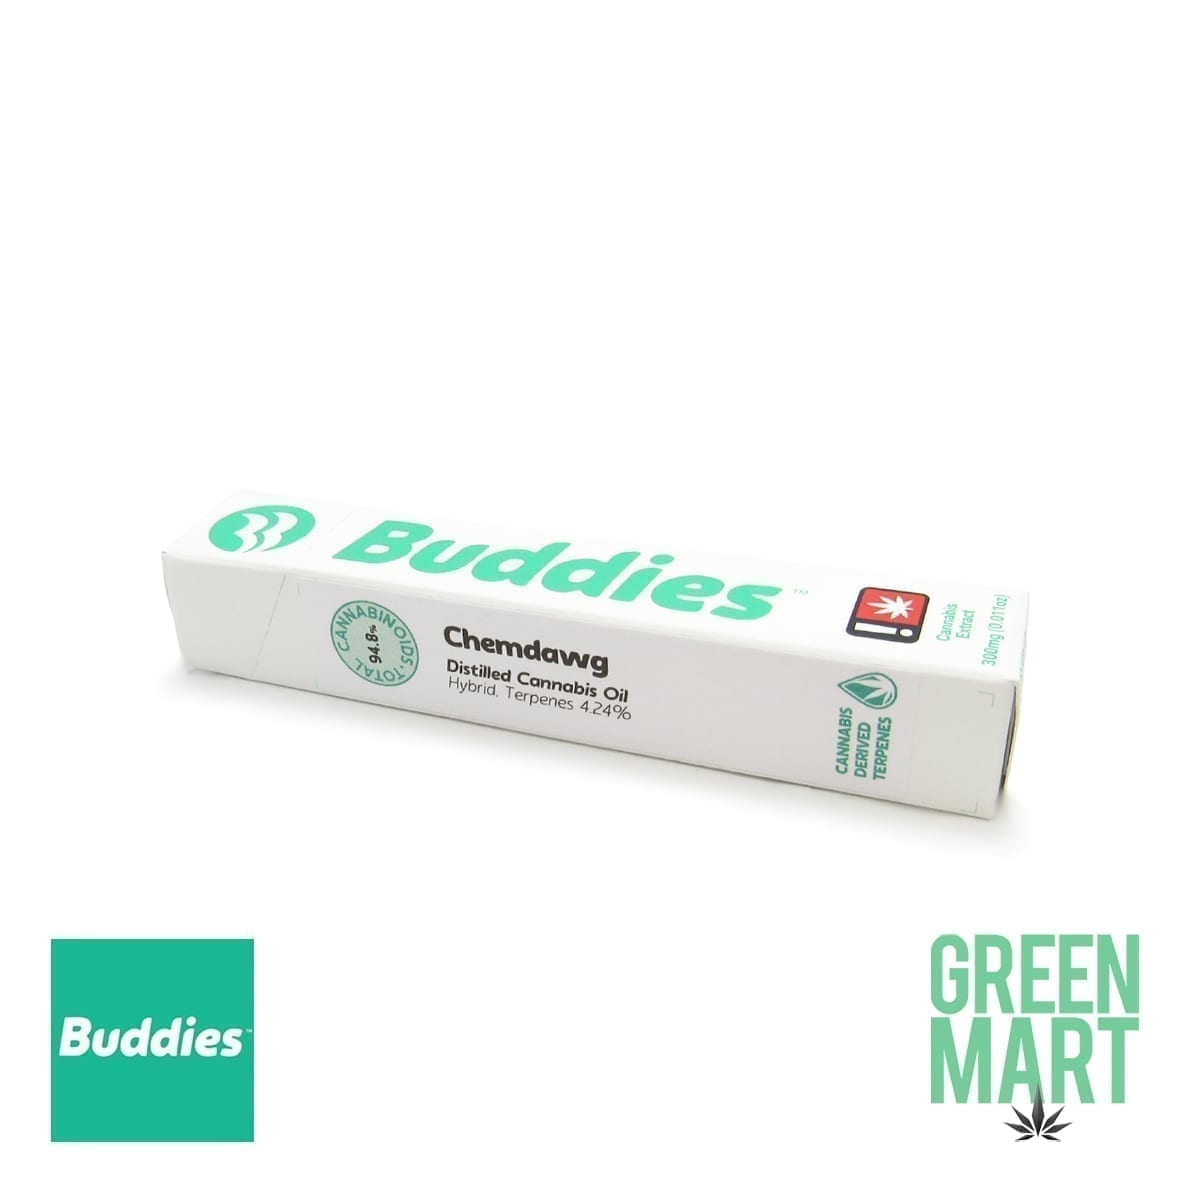 Buddies Brand Disposable Vape - ChemDawg